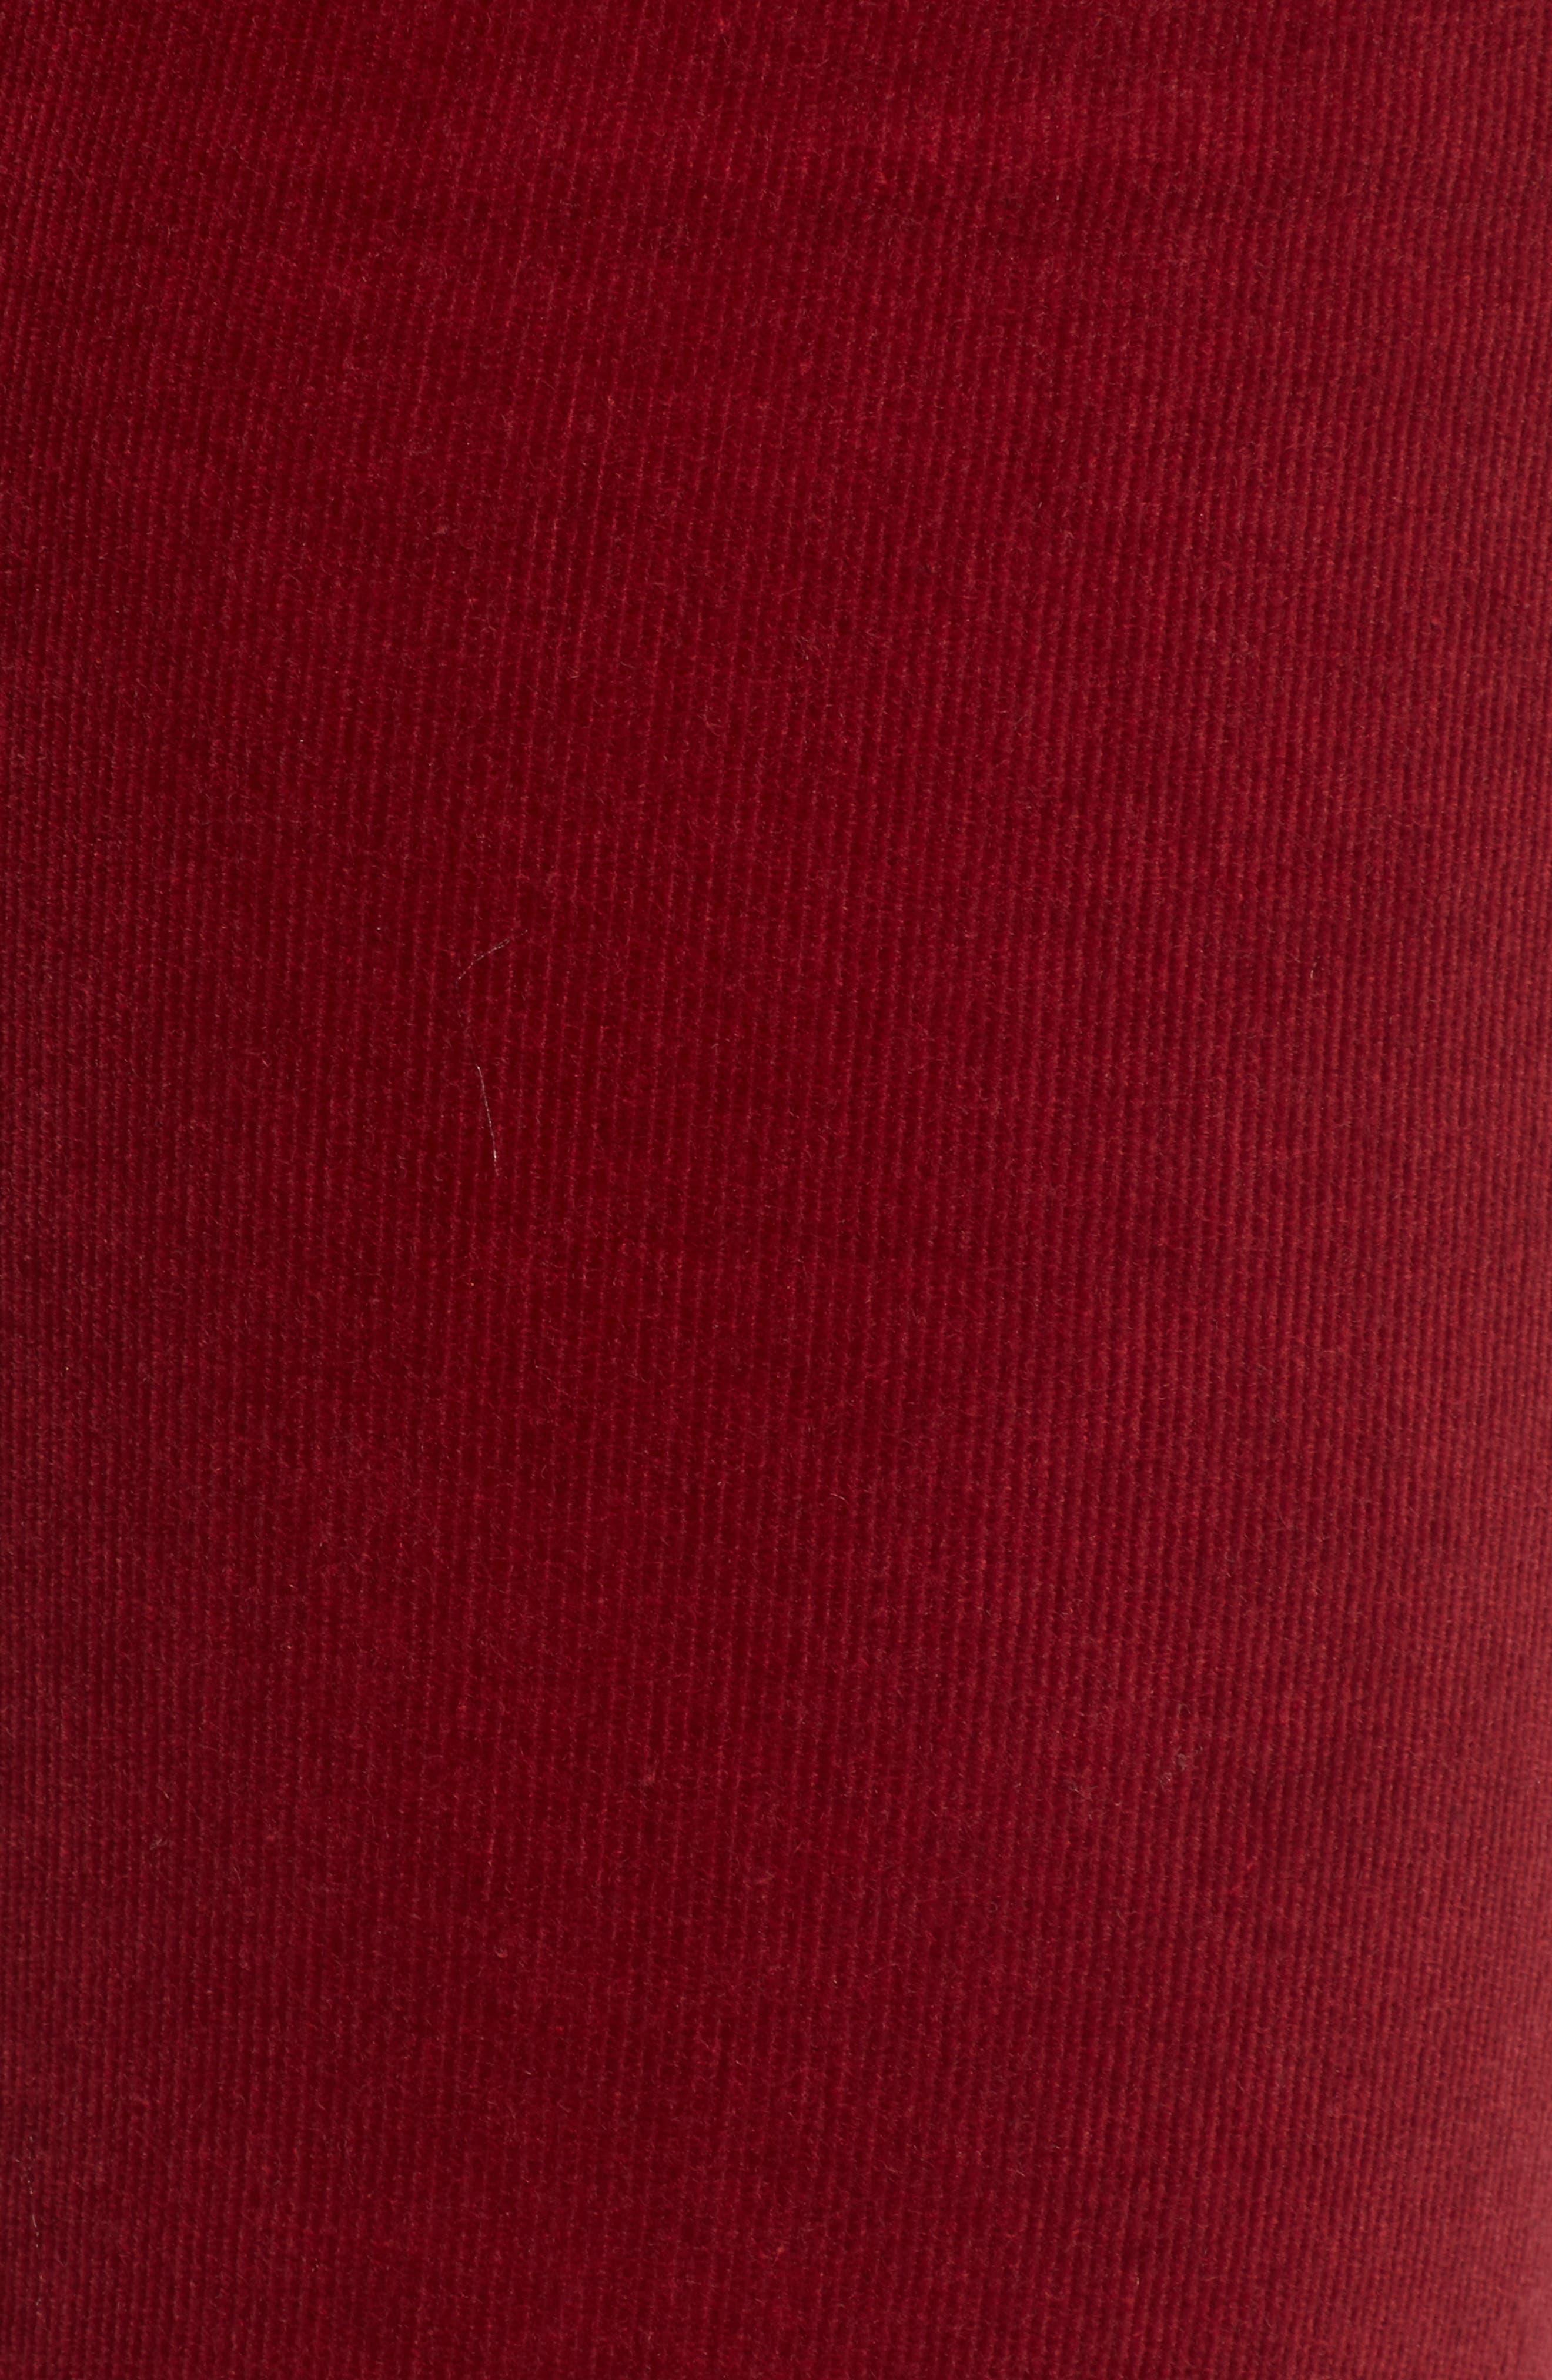 'Diana' Stretch Corduroy Skinny Pants,                             Alternate thumbnail 219, color,